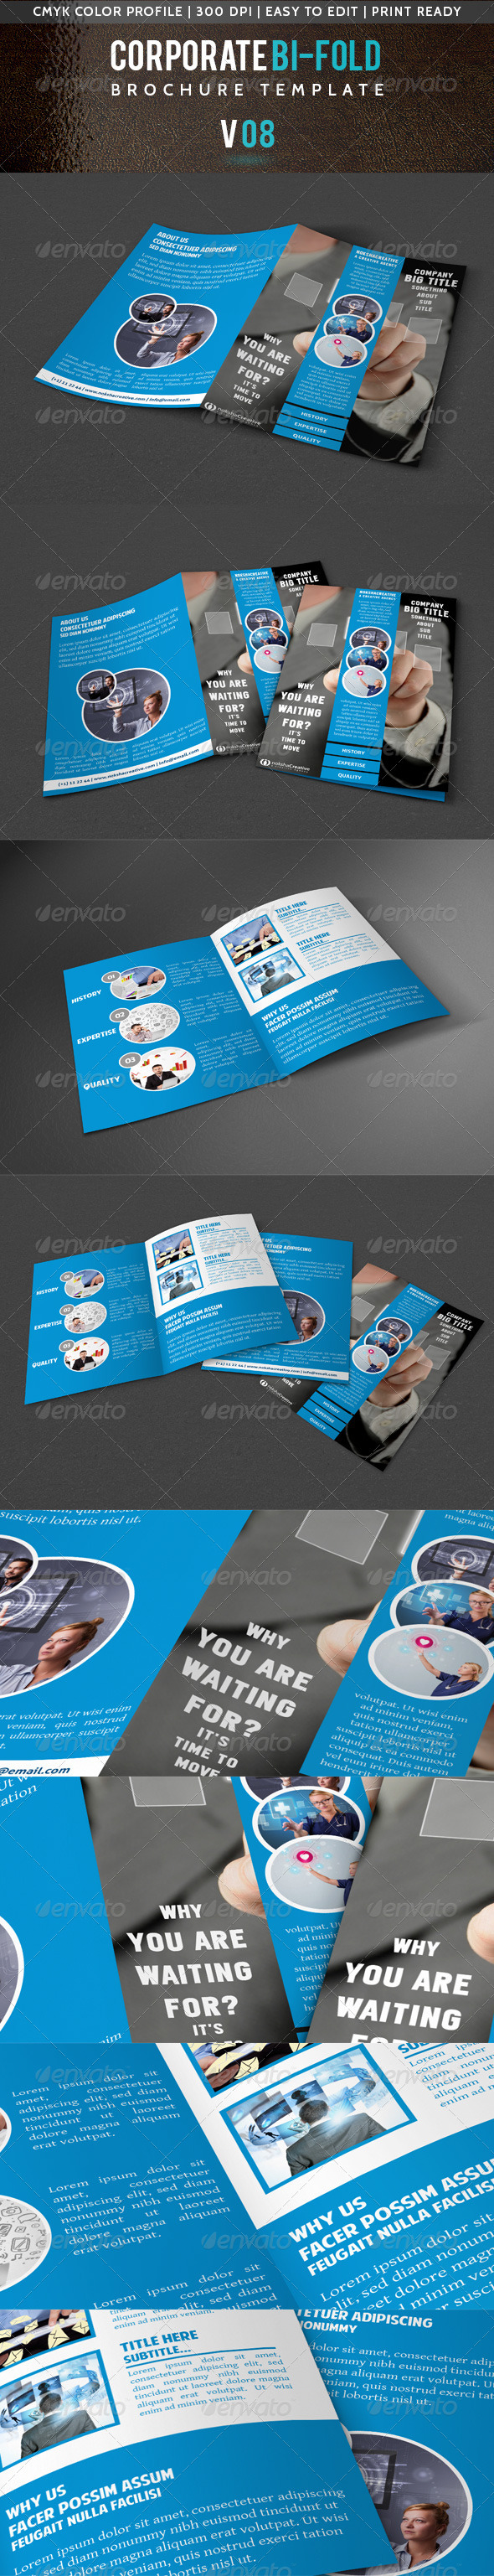 GraphicRiver Corporate Bi-Fold Brochure V 08 5532232